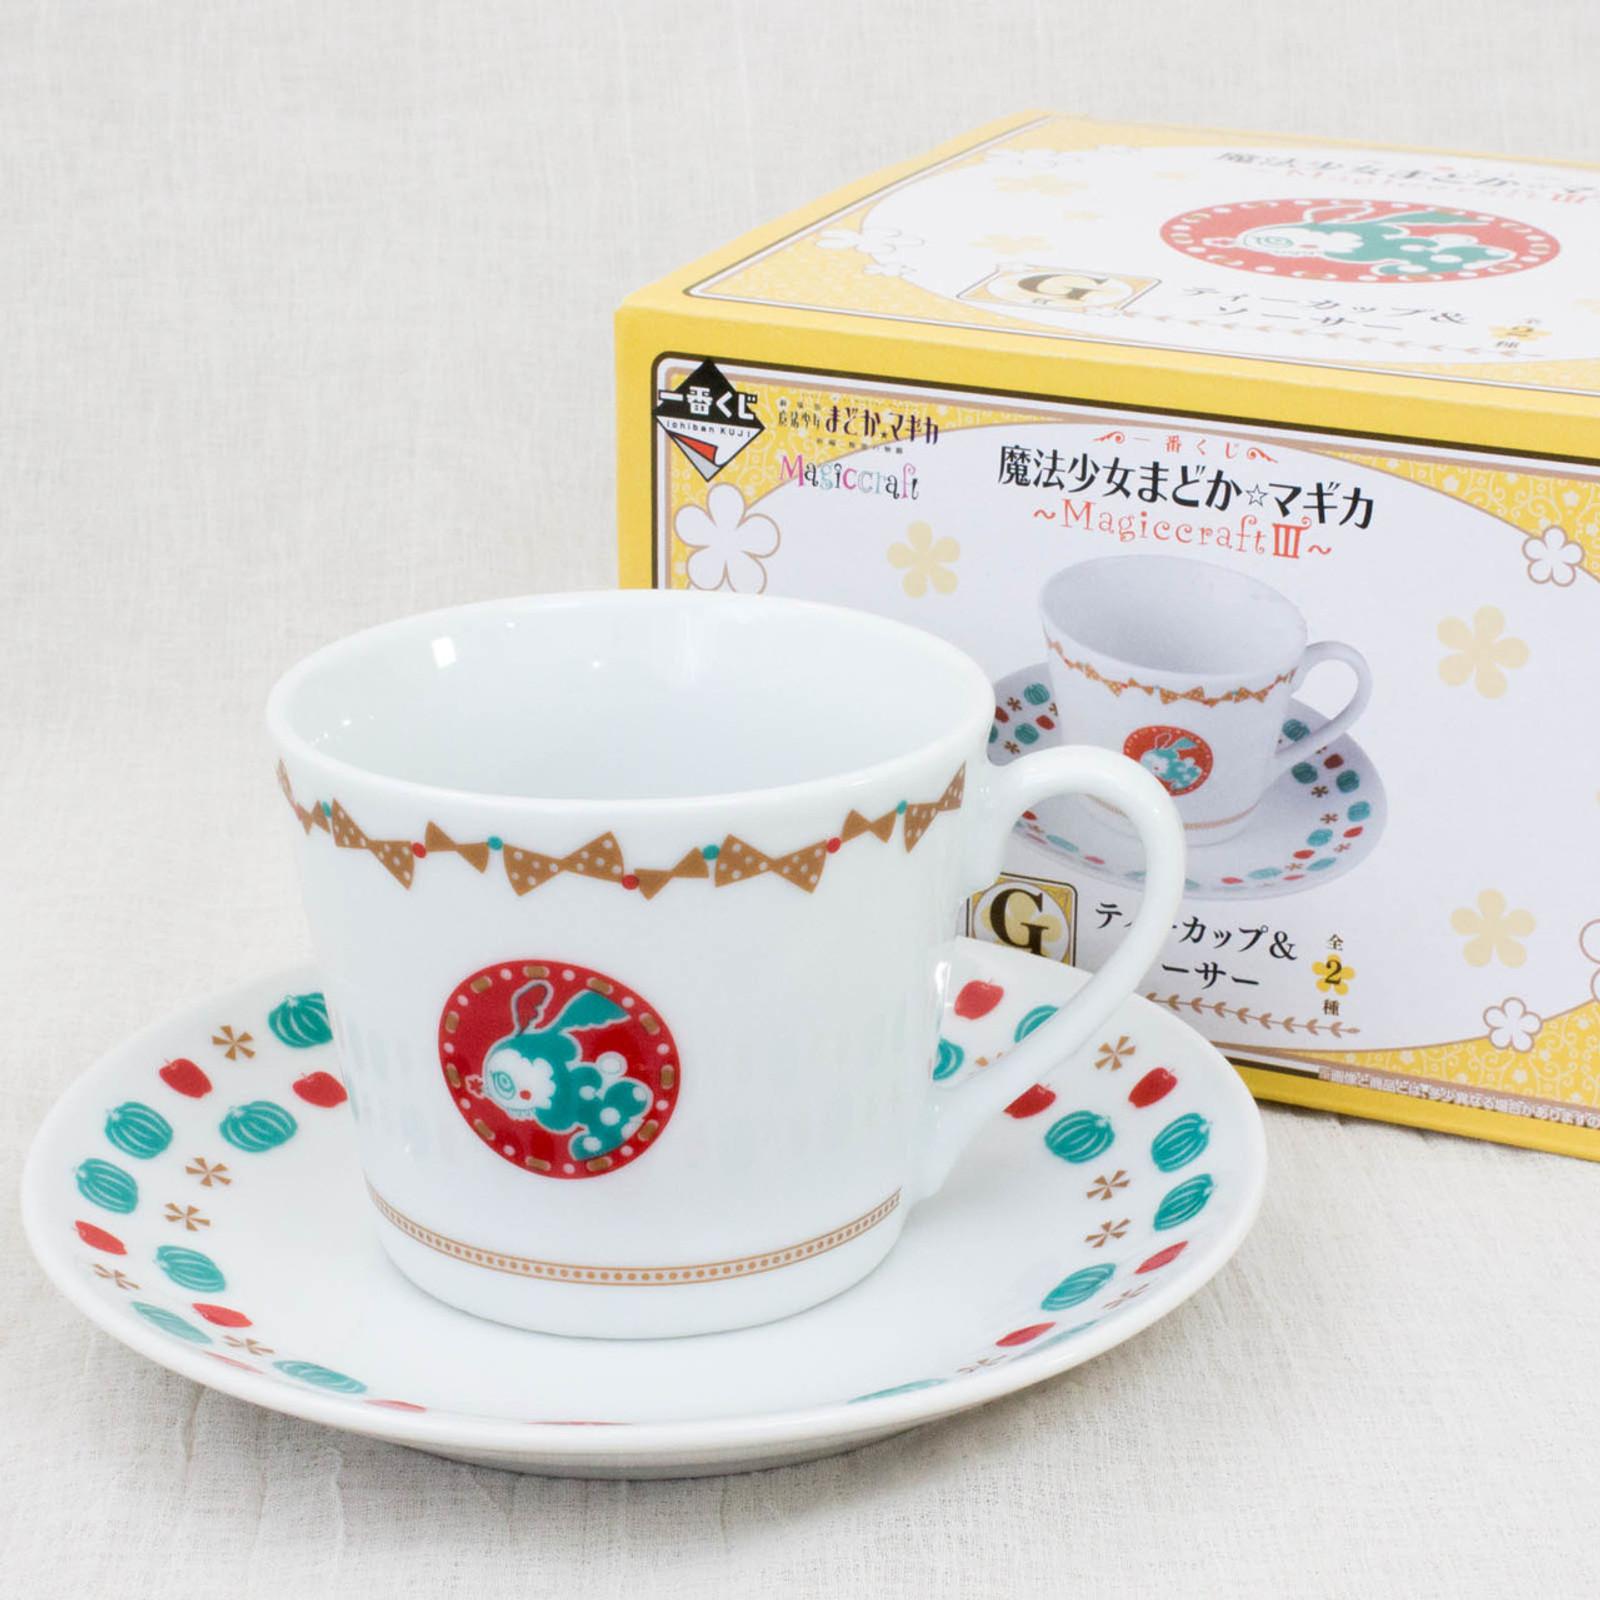 Puella Magi Madoka Magica Sweet Witch Transform Charlotte Tea cup & Saucer JAPAN